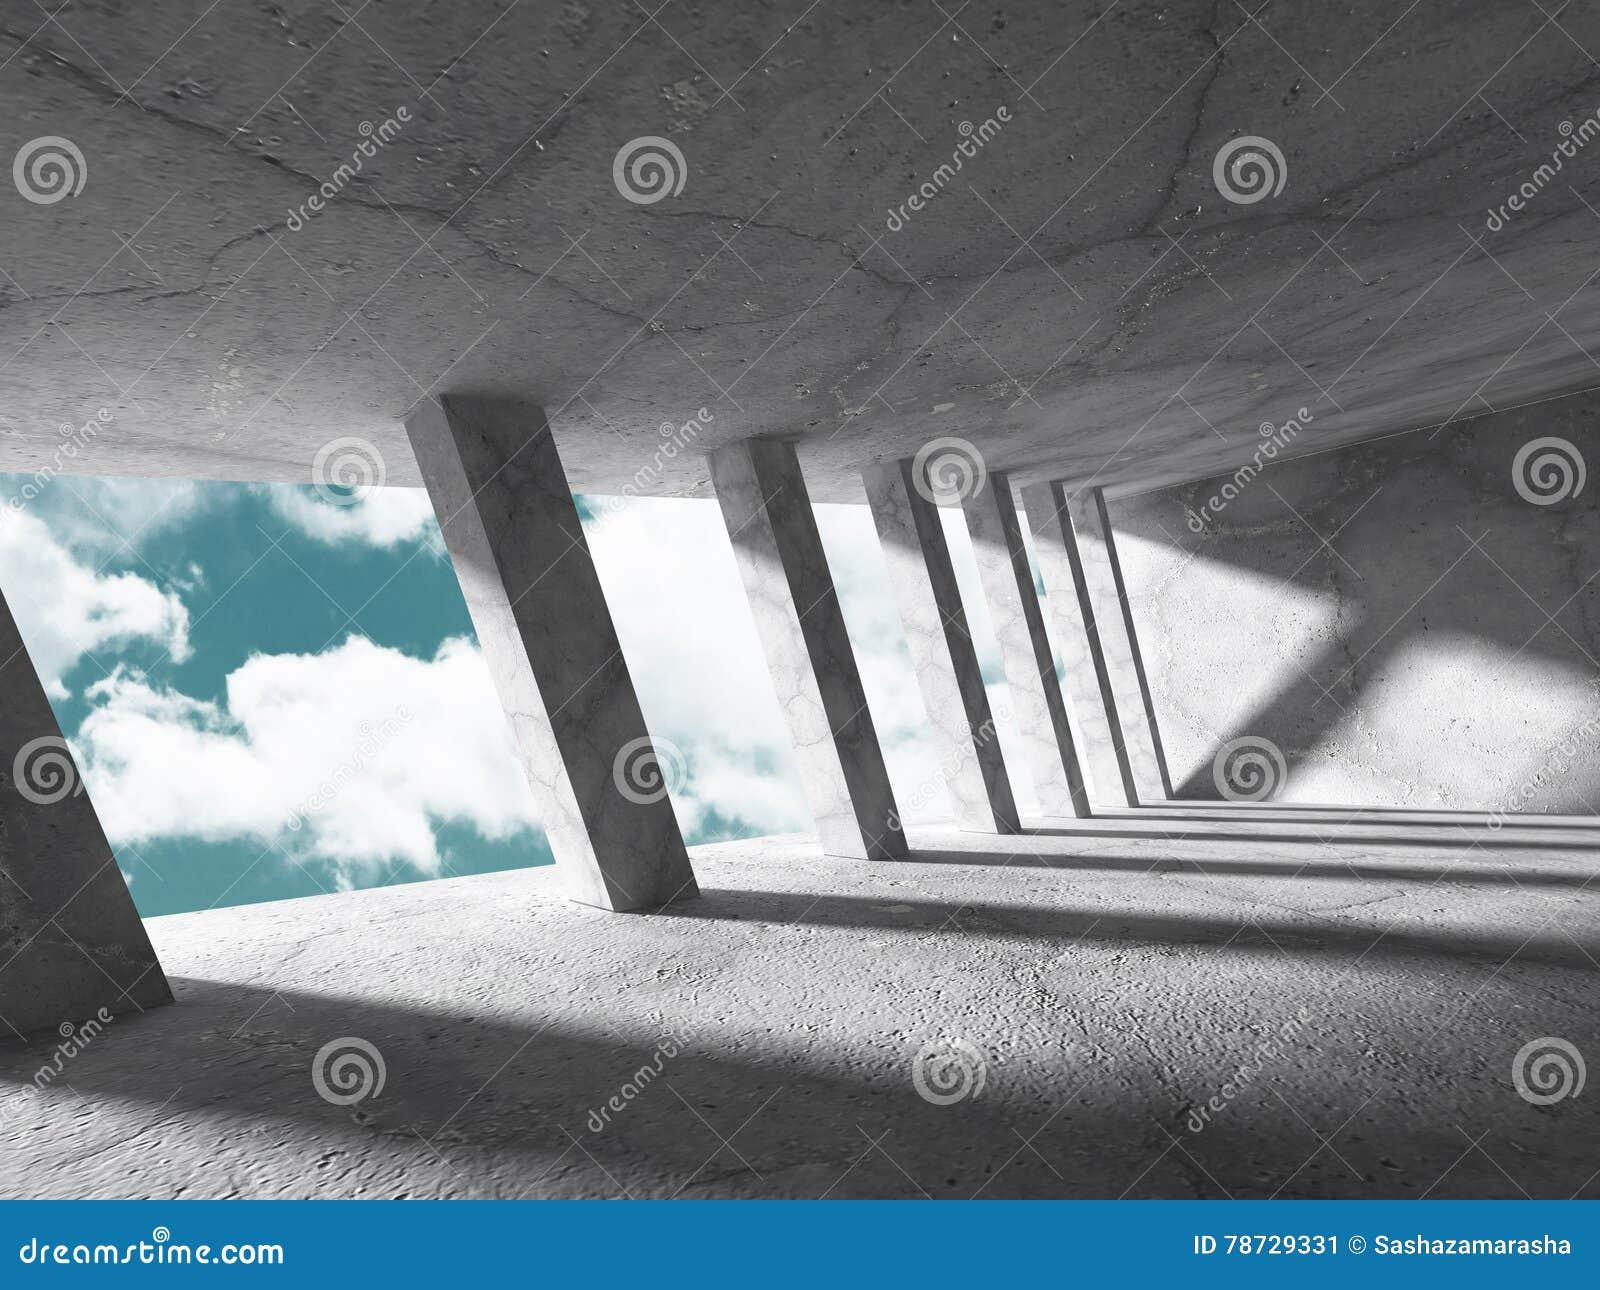 Abstrakt konkret arkitekturkonstruktion på himmelbakgrund